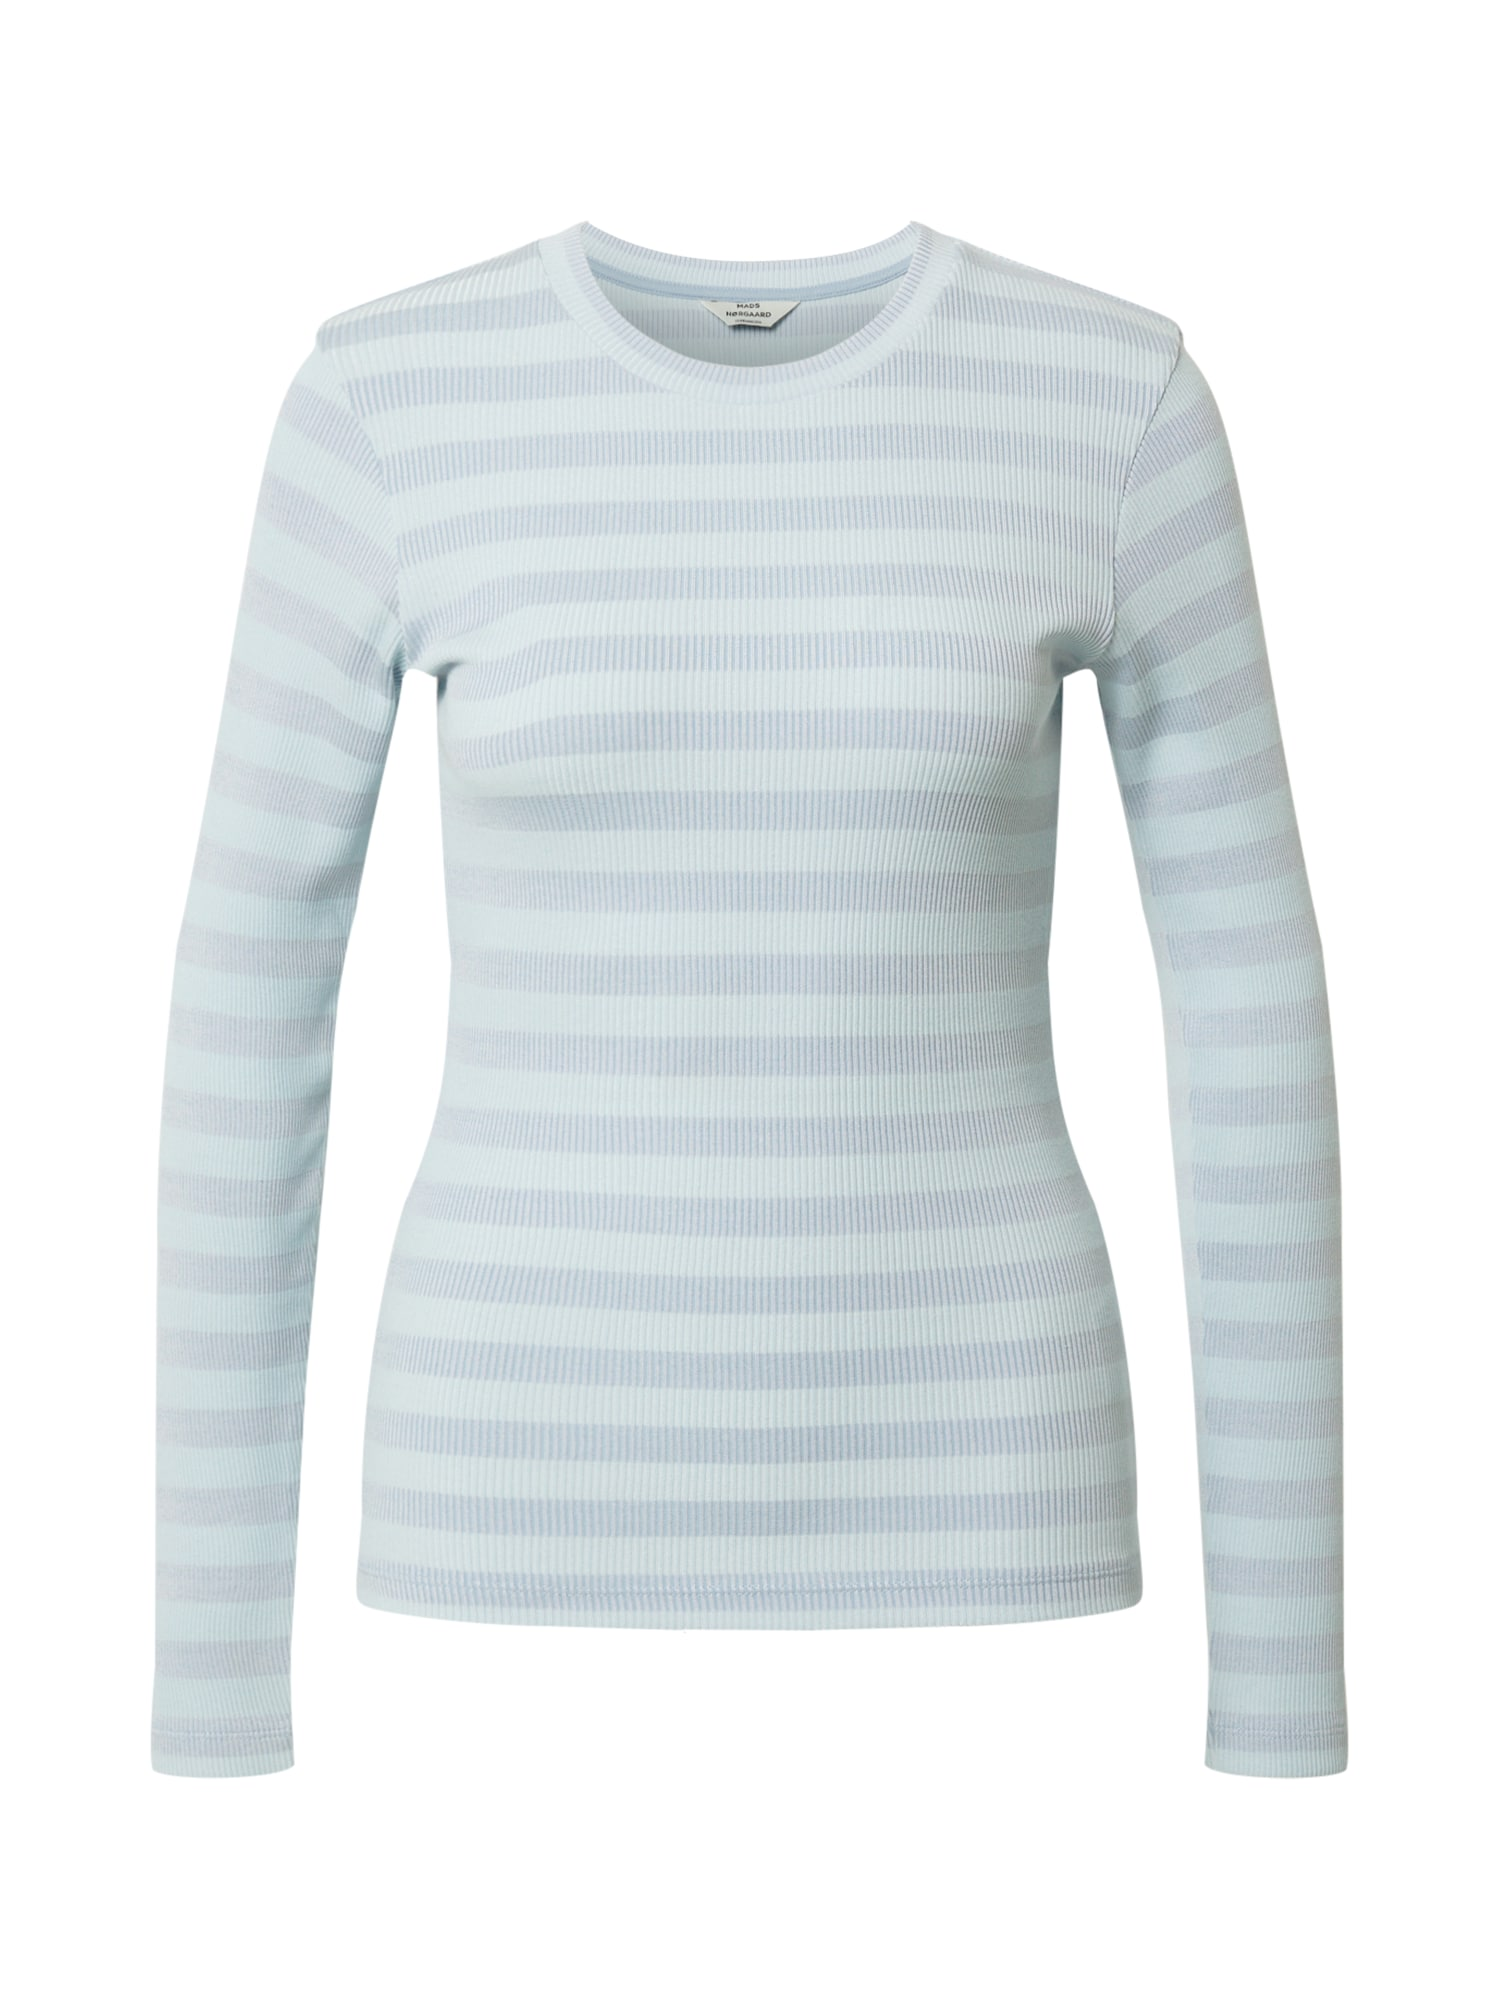 MADS NORGAARD COPENHAGEN Marškinėliai mėlyna dūmų spalva / azuro